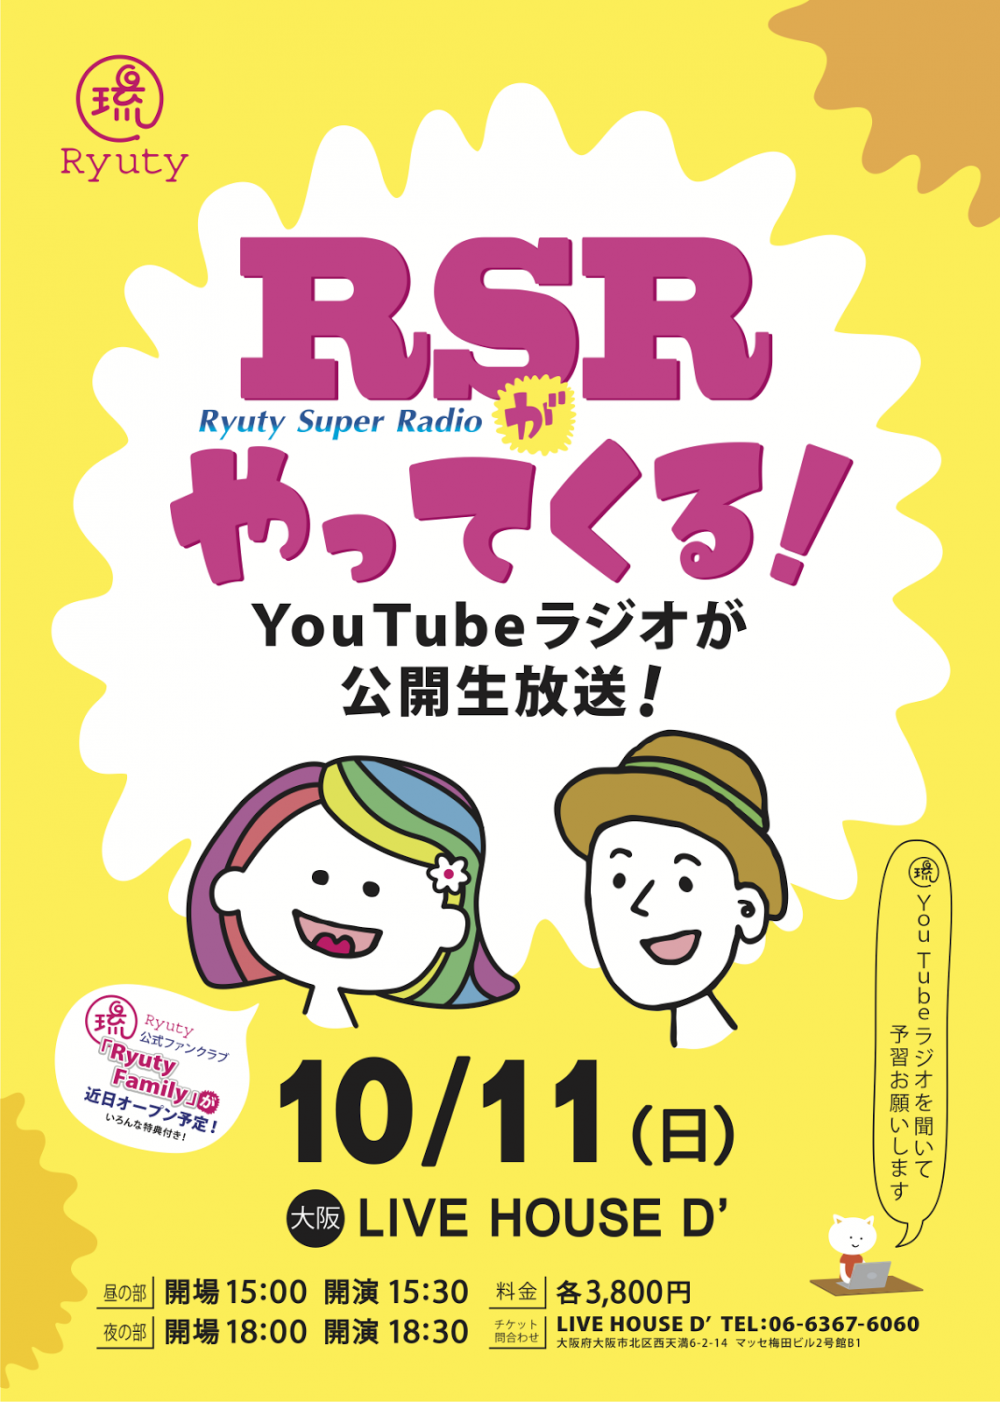 Ryuty Super Radioがやってくる!